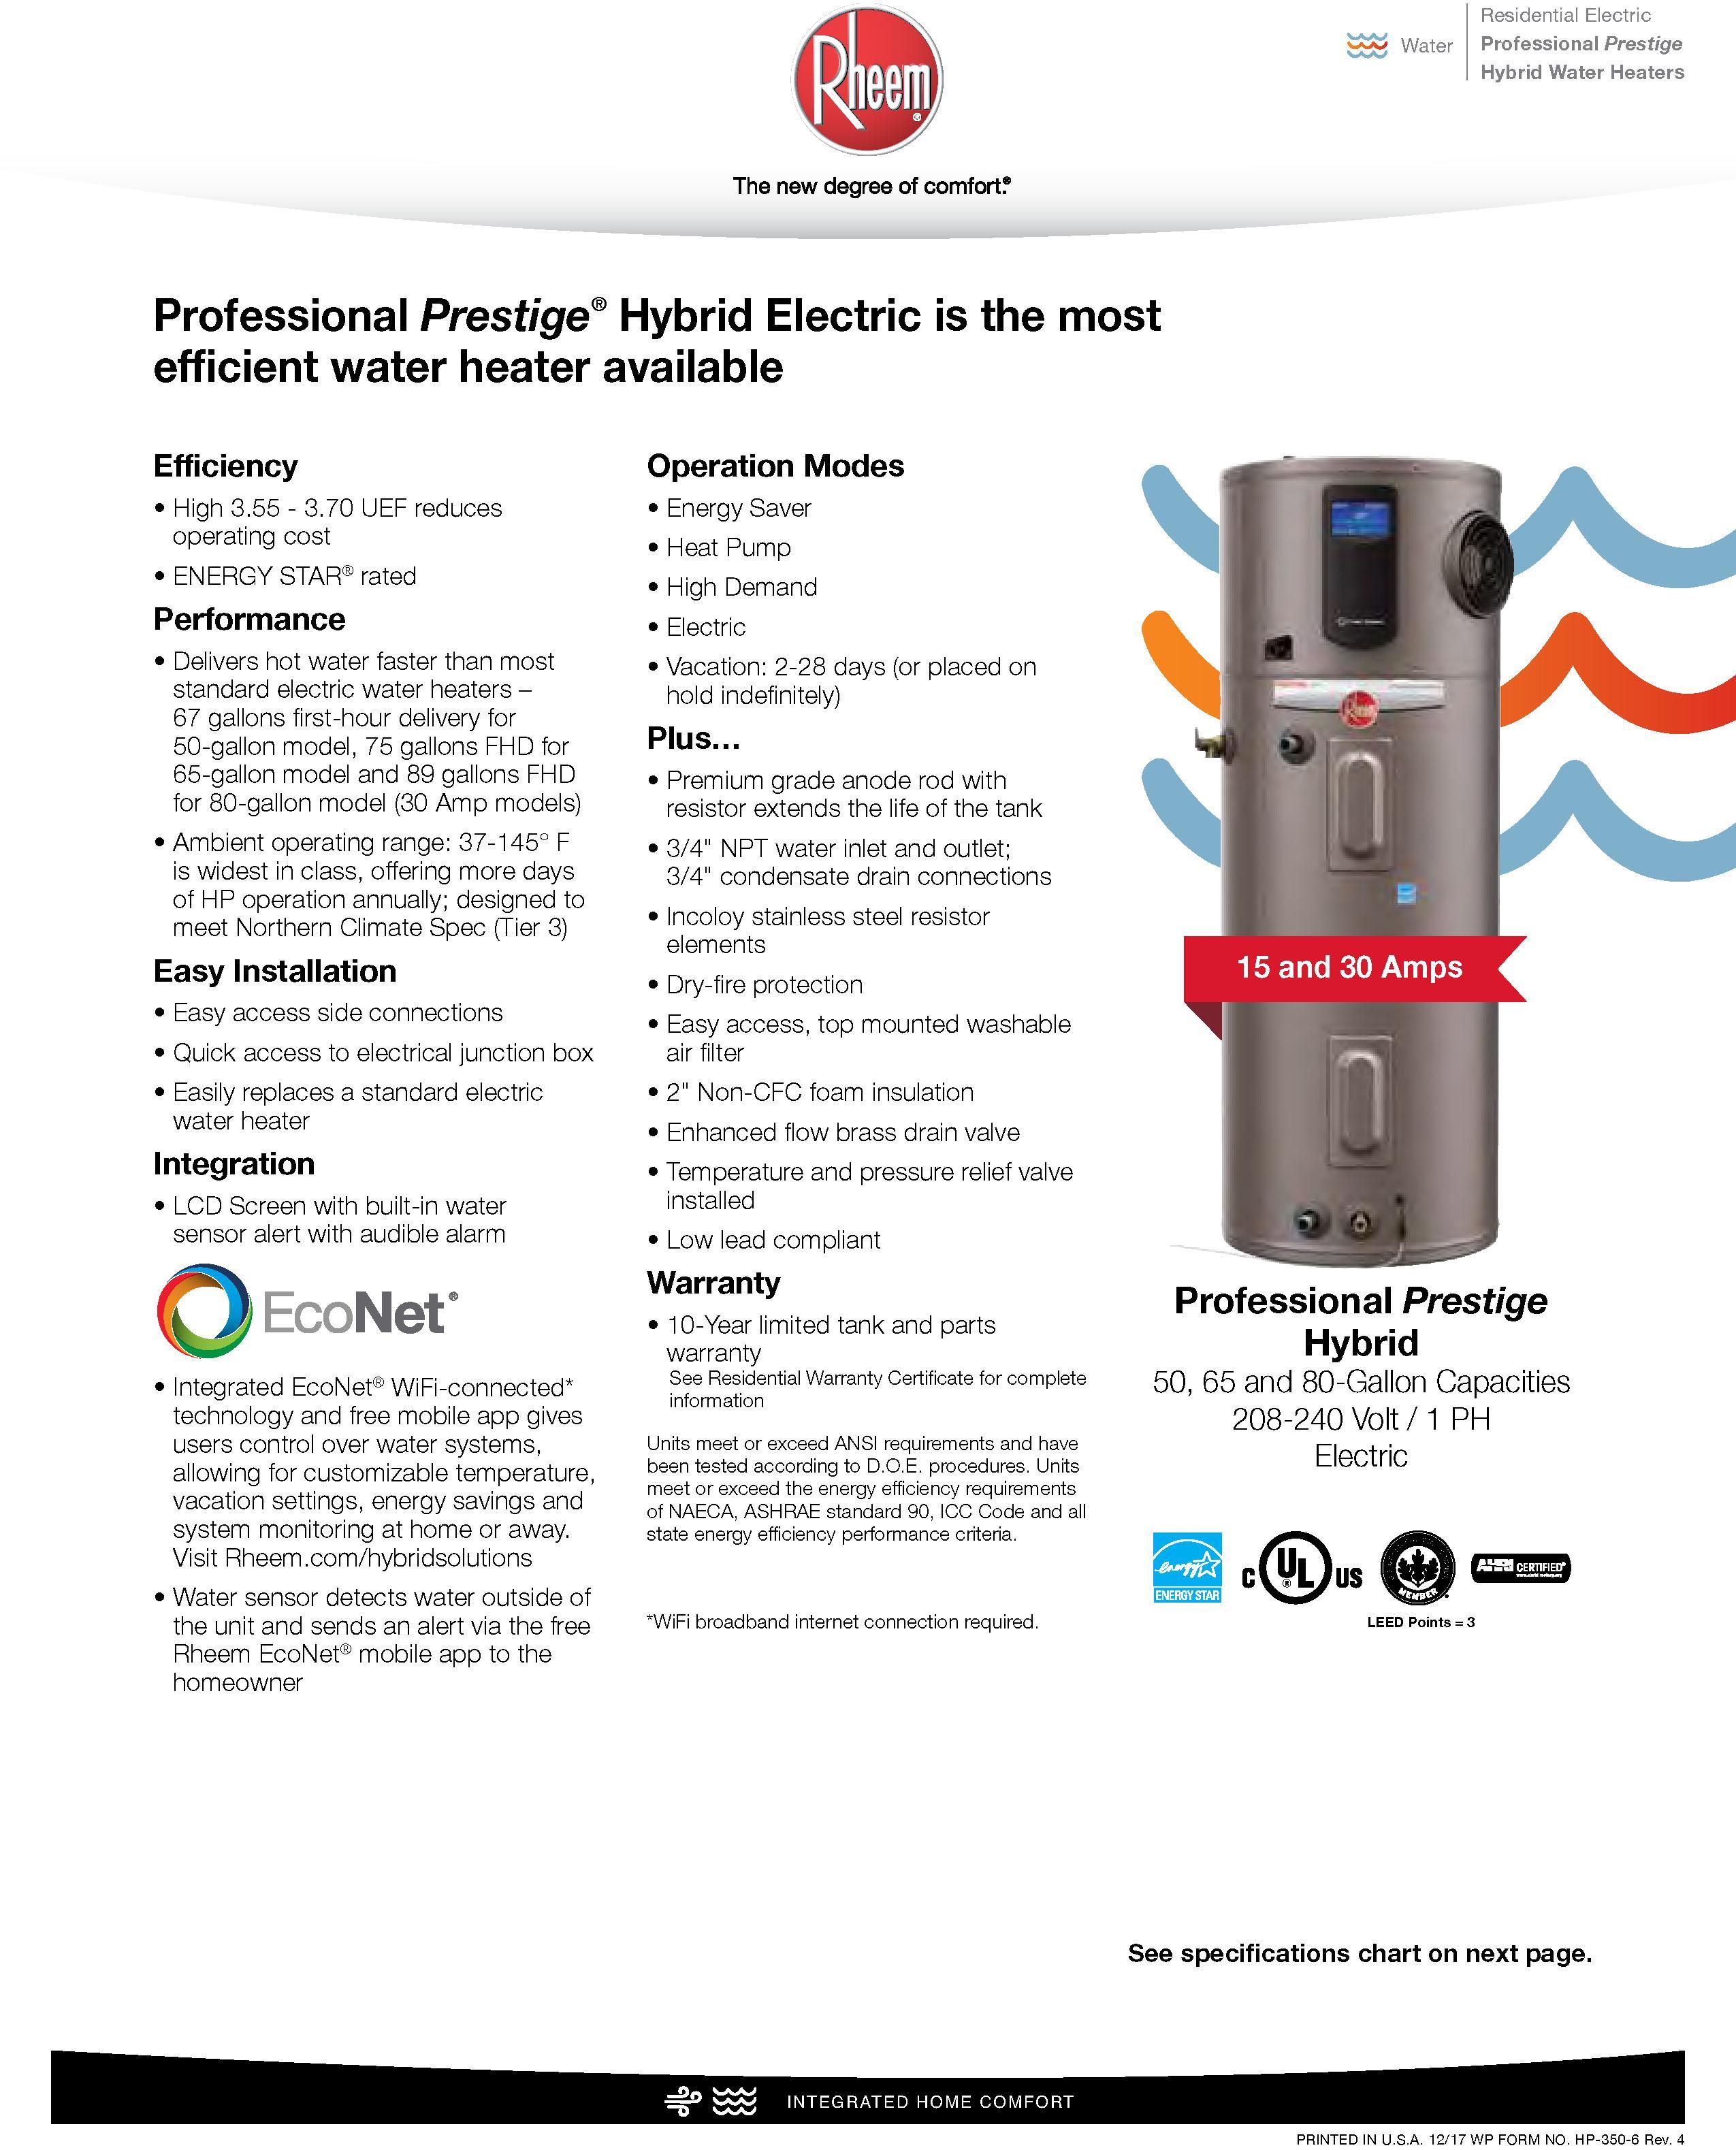 Rheem Hybrid Heat Pump Water Heater